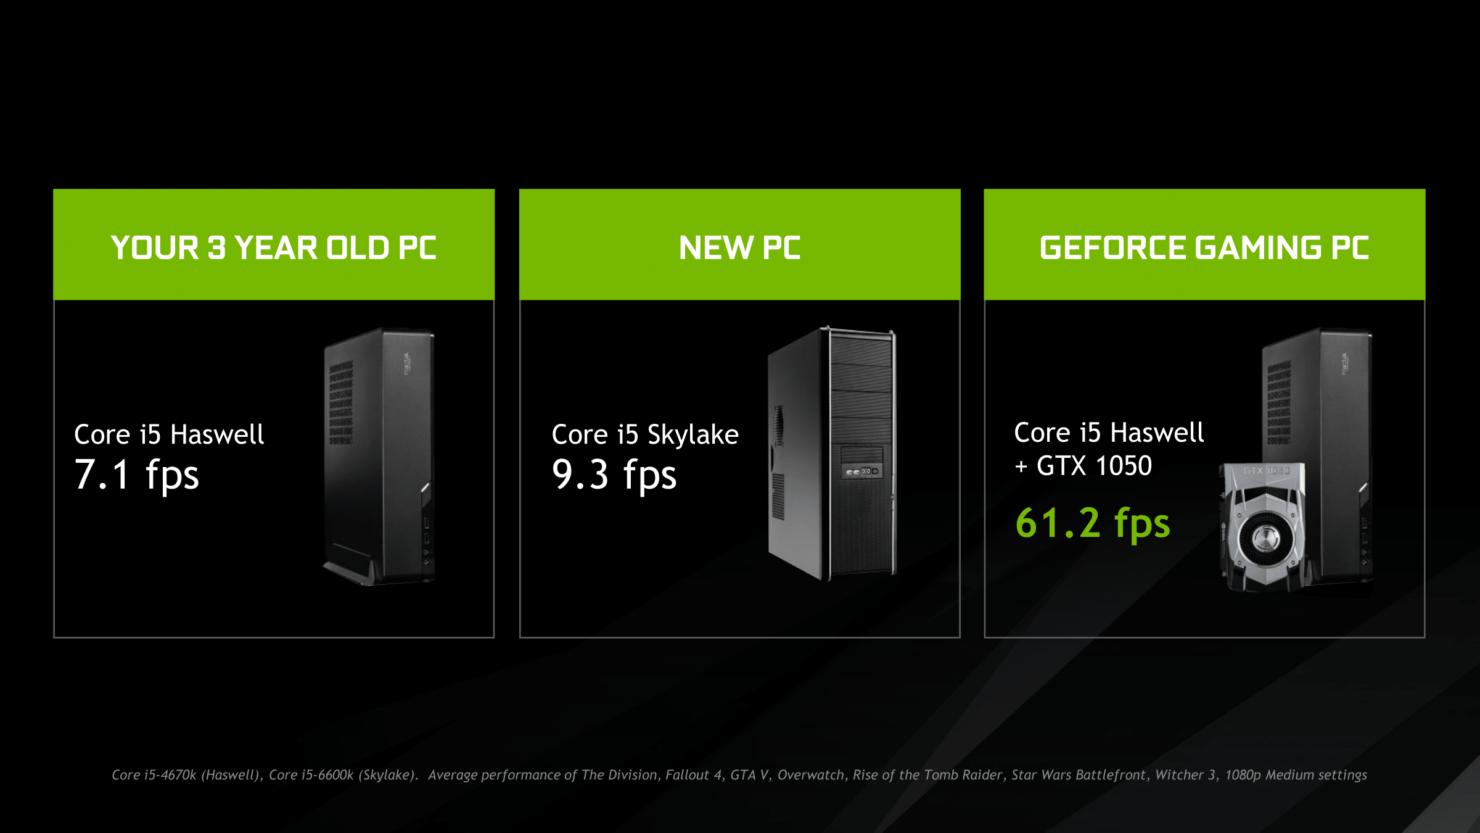 nvidia-geforce-gtx-1050-ti-and-gtx-1050-official_igpu-vs-gpu